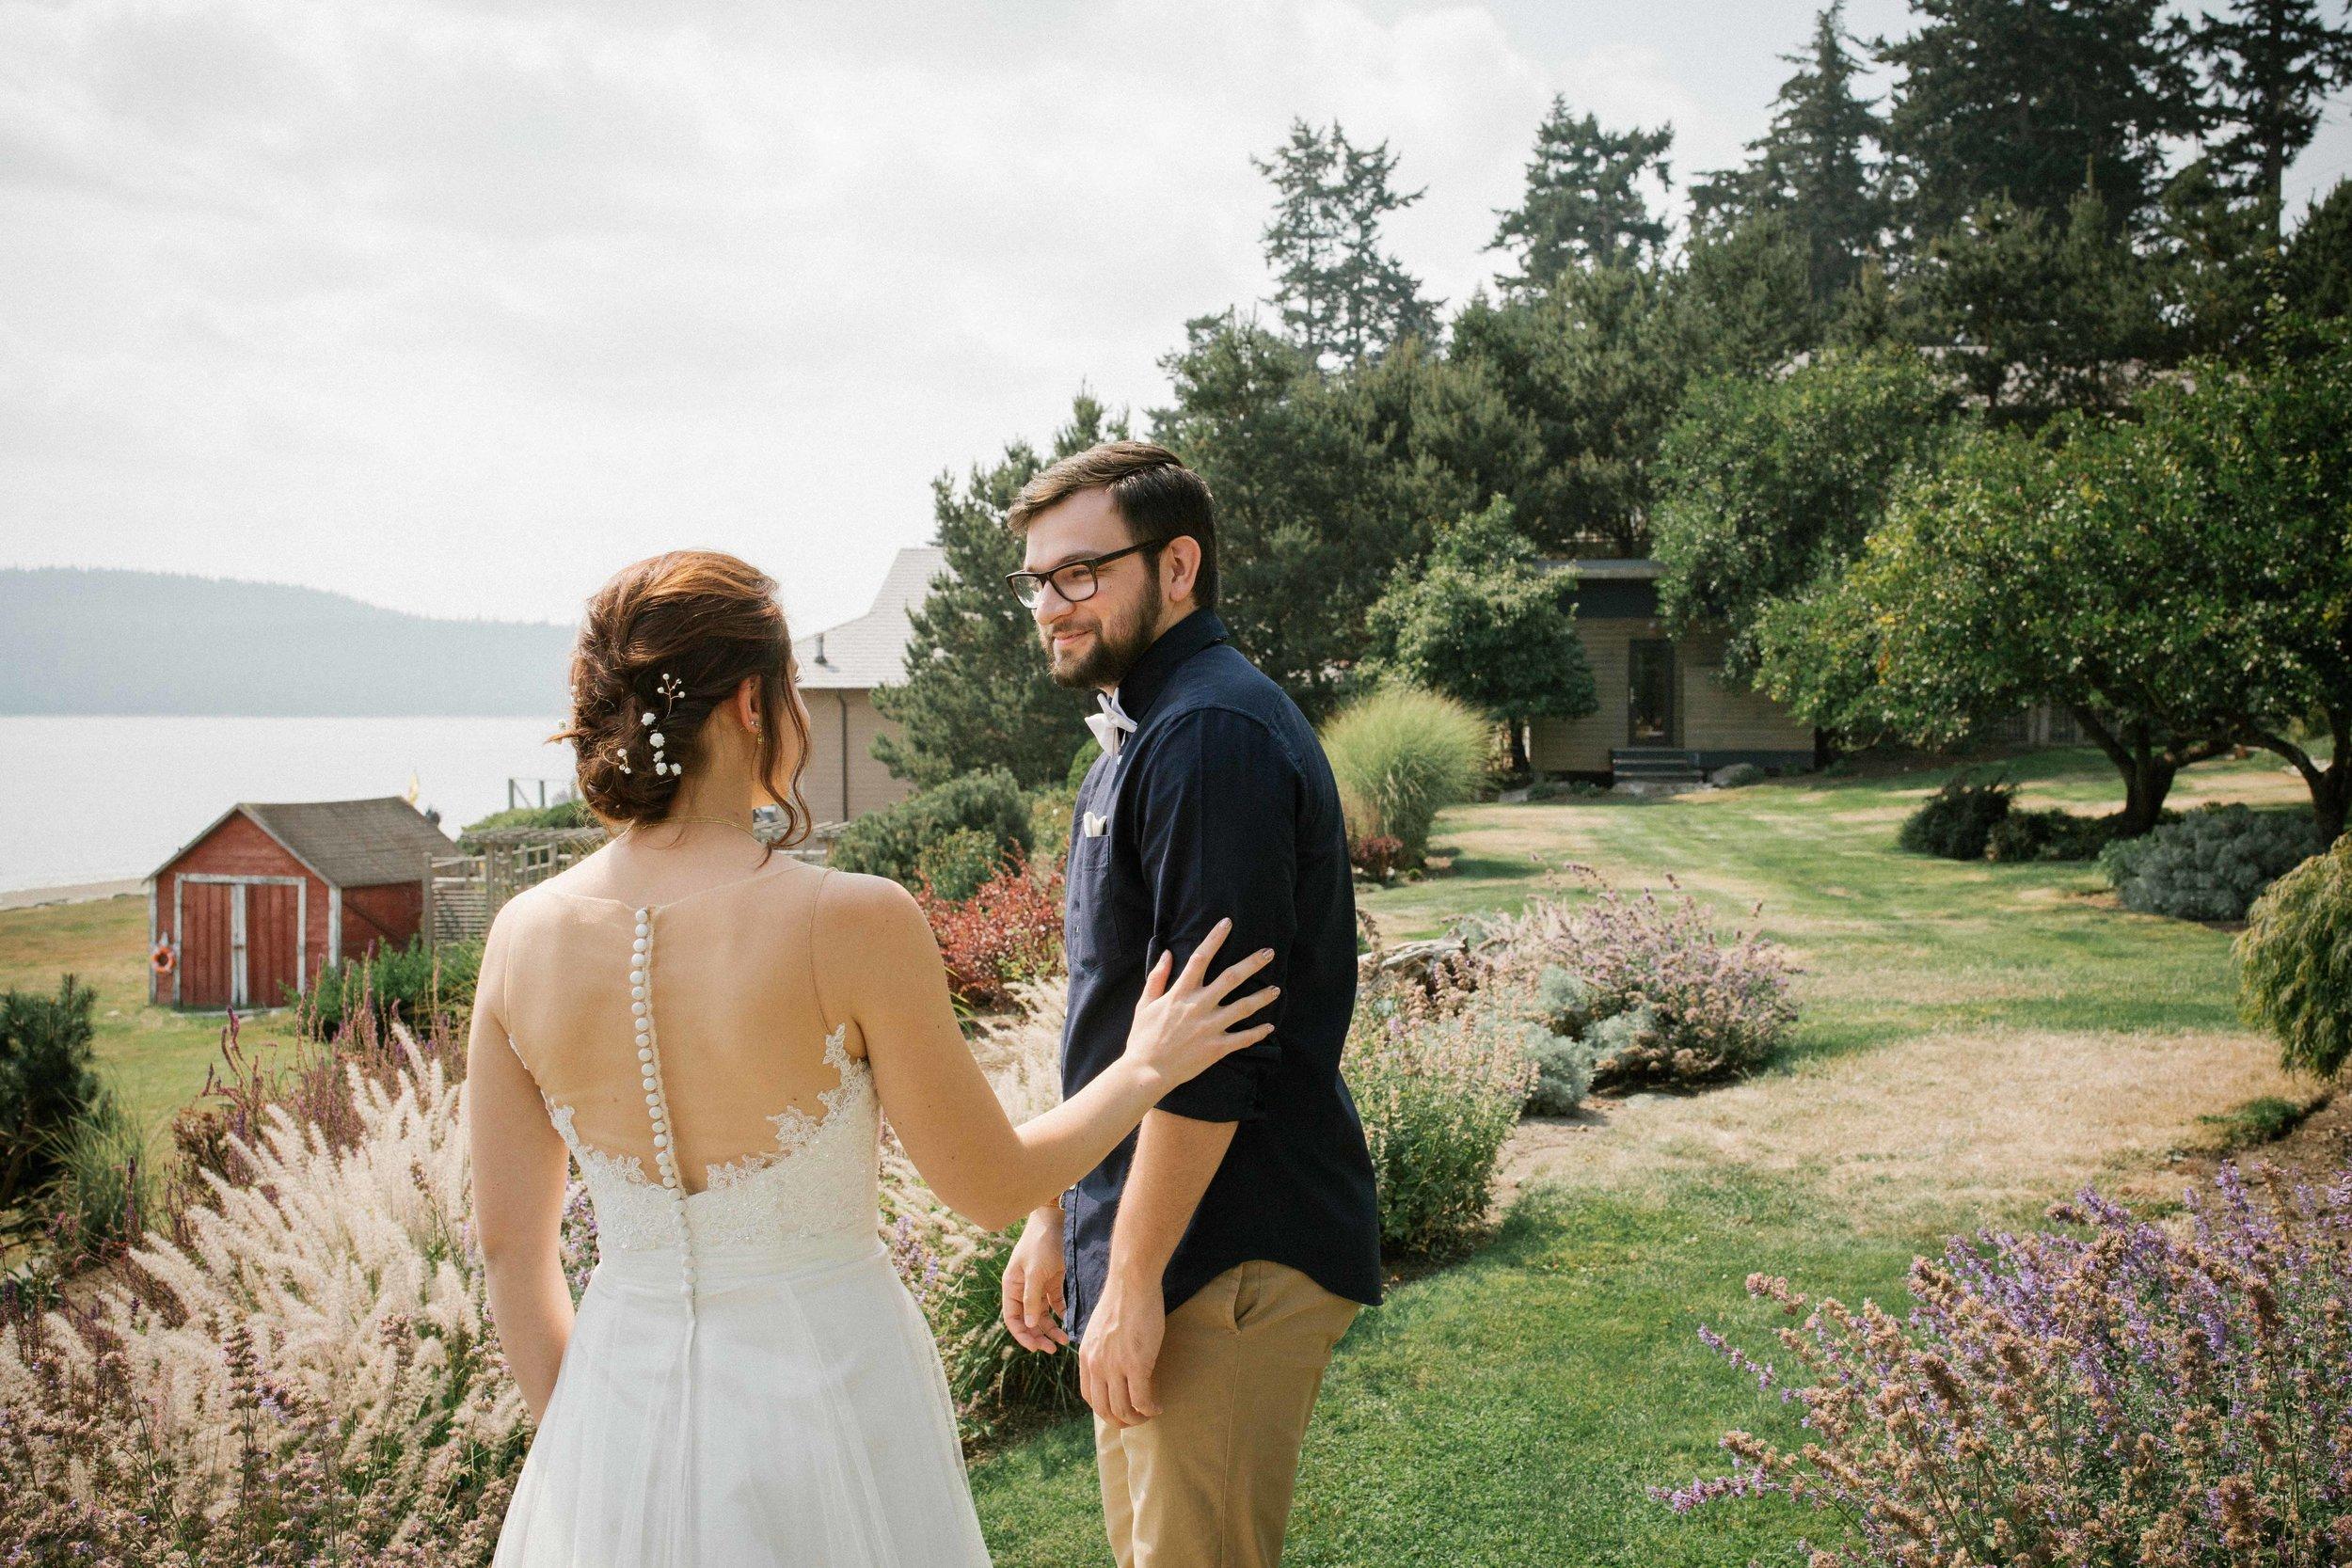 deception-pass-wedding-15.jpg